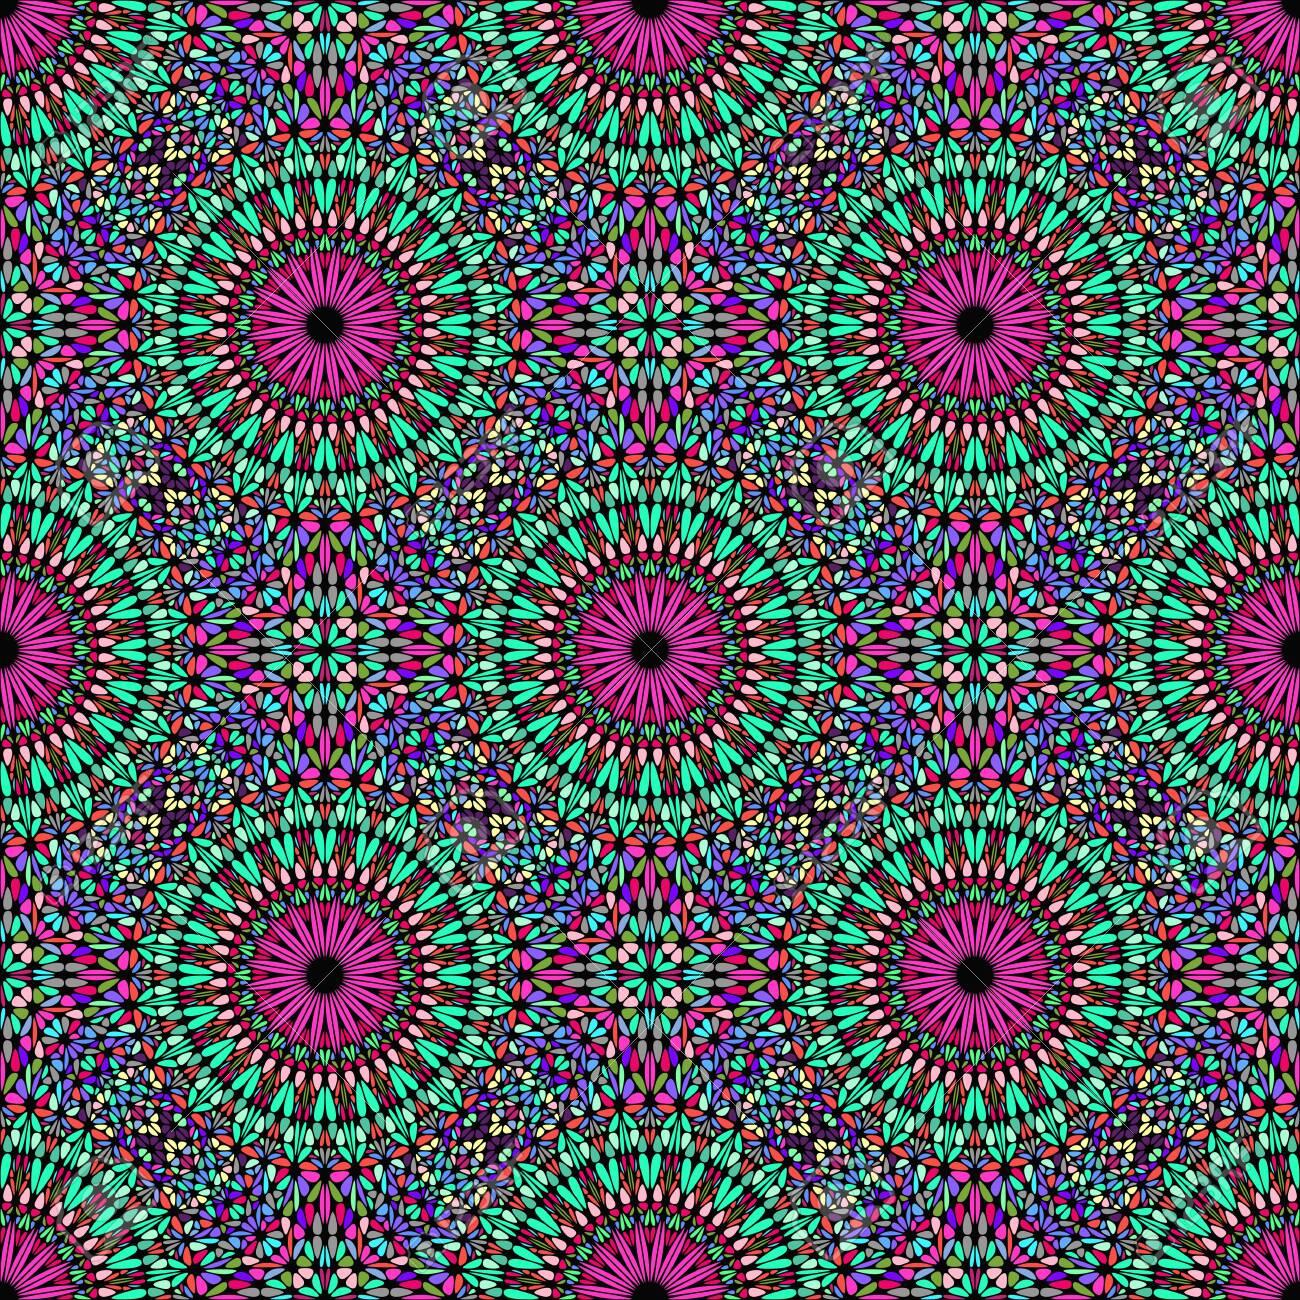 Abstract Bohemian Seamless Multicolor Geometrical Mandala Garden